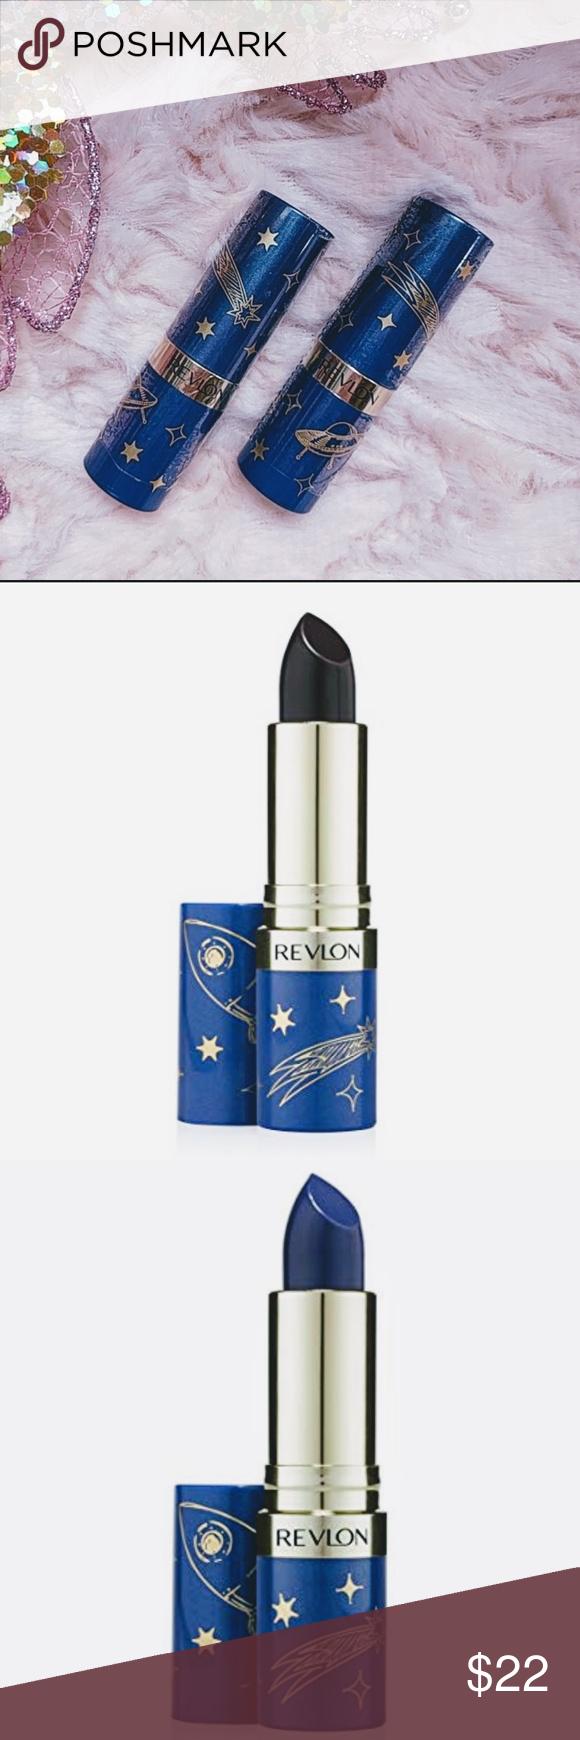 Revlon Super Lustrous Lipstick Dark Queen/Blue Sky Limited Edition